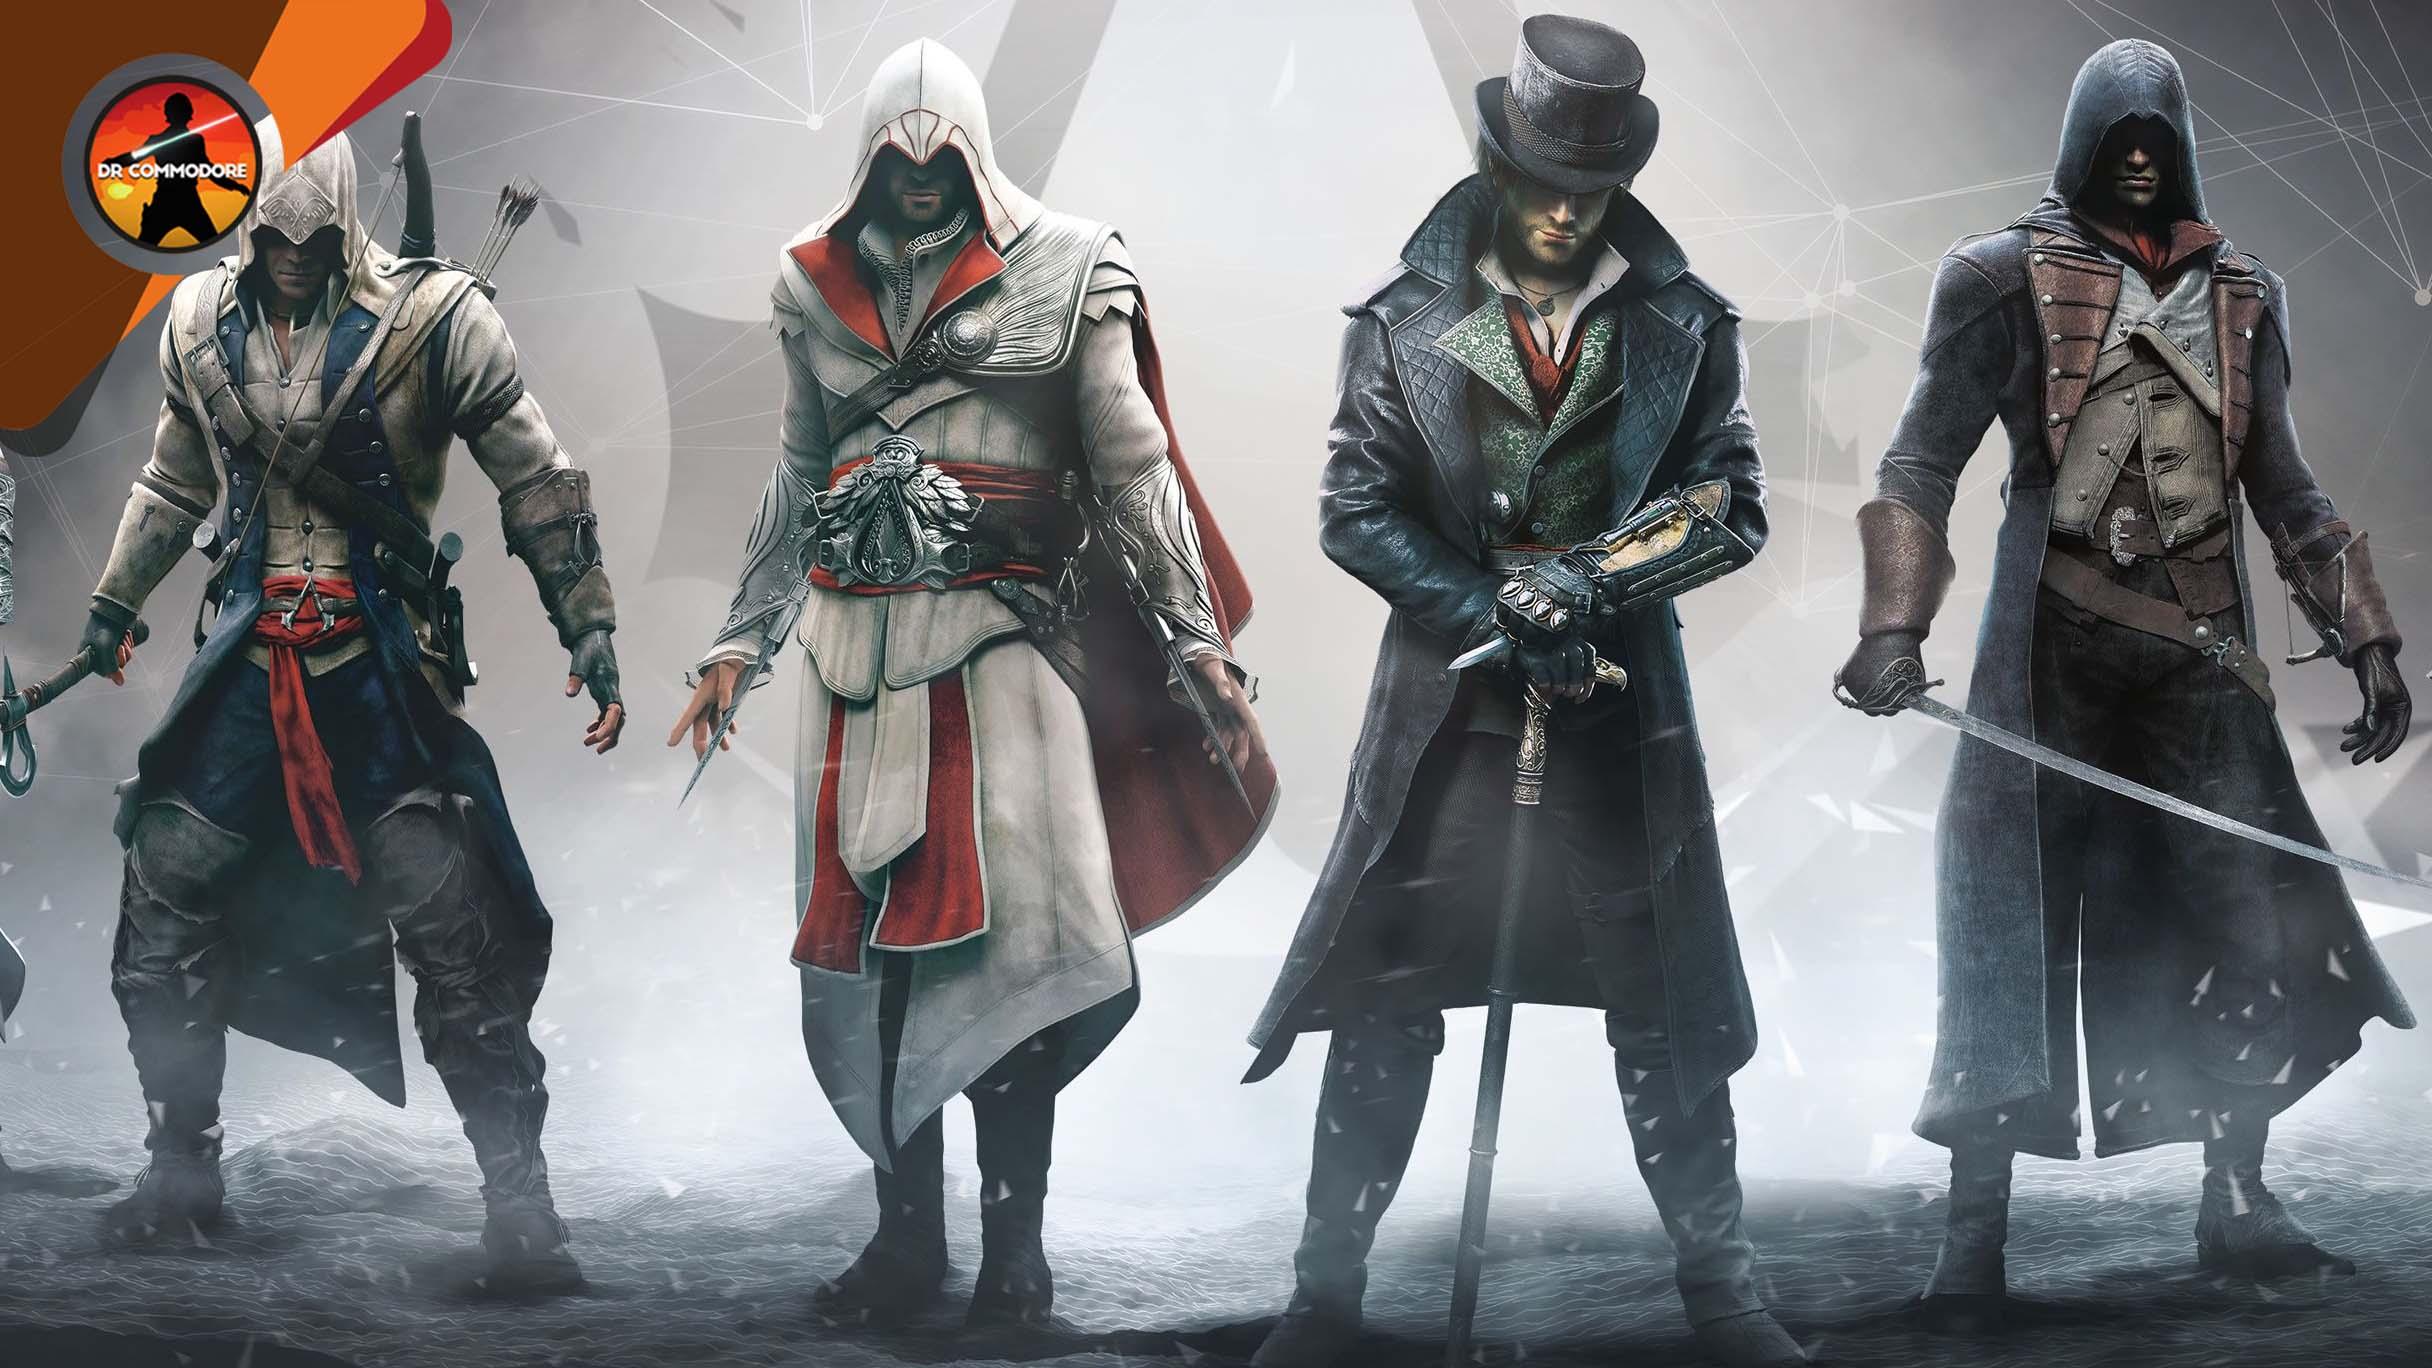 Assassin's Creed Syndicate, immagine di copertina